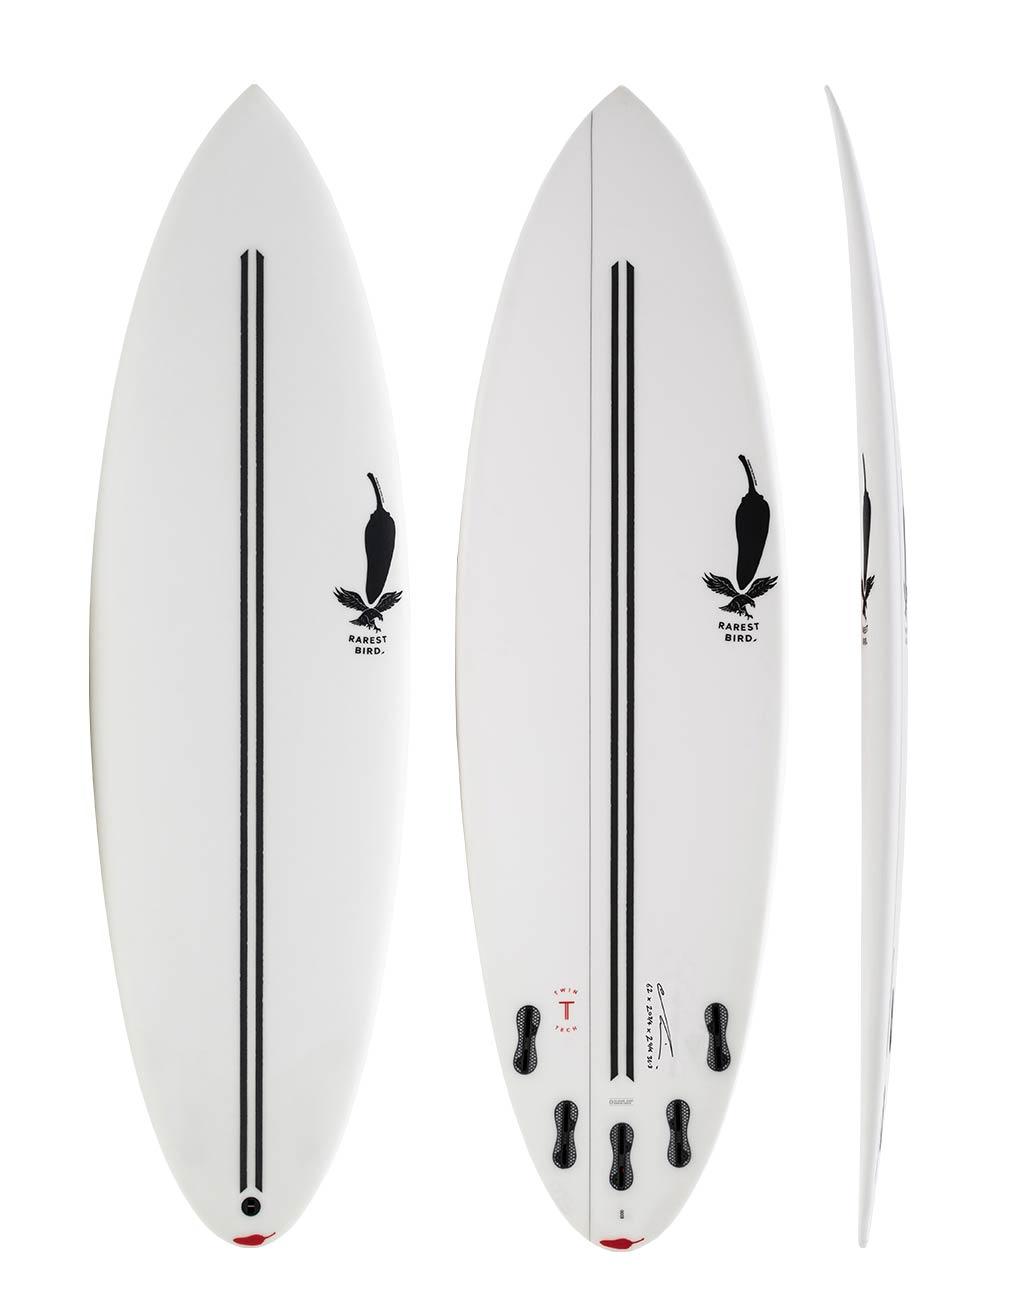 Chilli Surfboards Rarest Bird TT